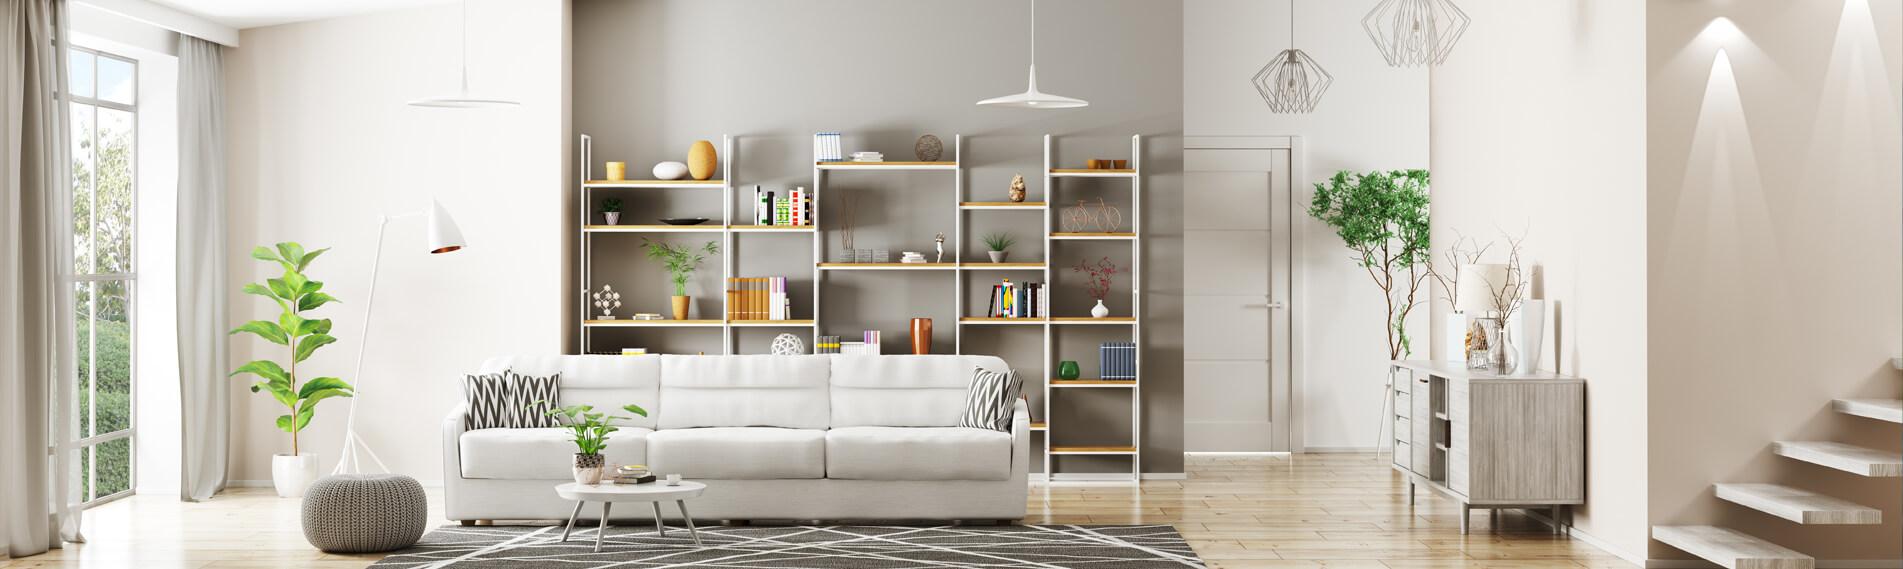 Home Decor | Item Categories | 411Look